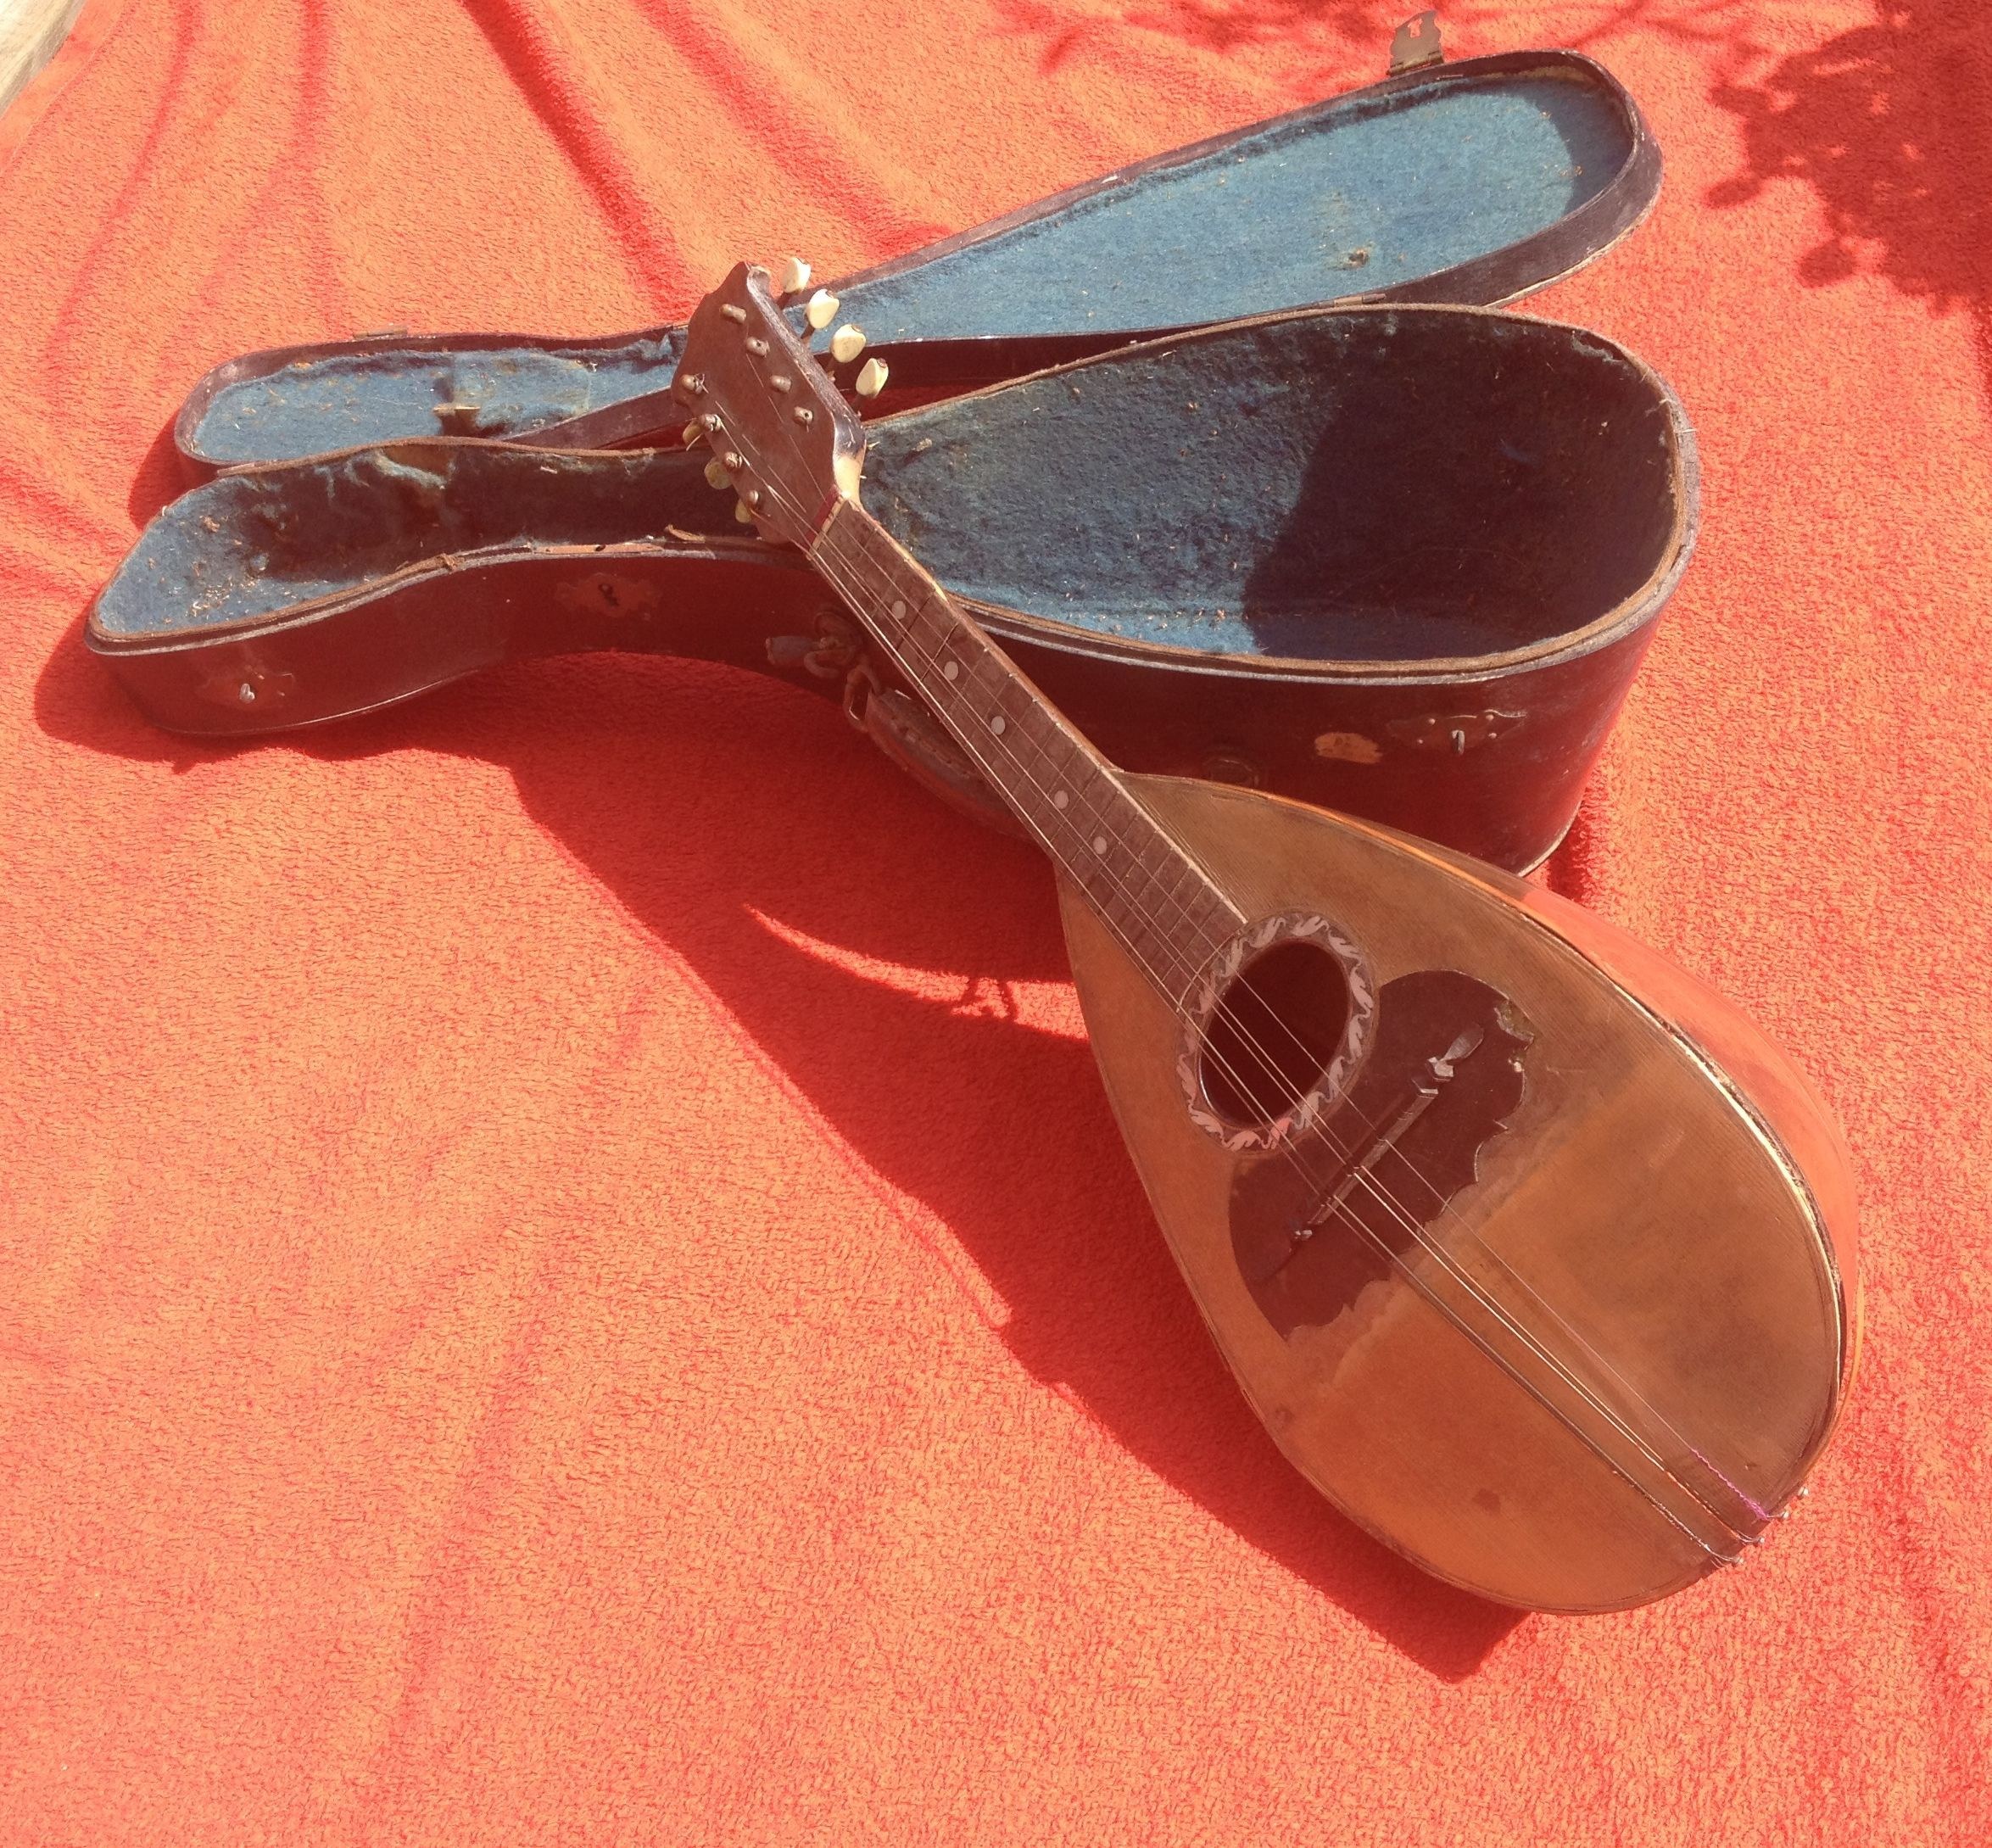 vintage mandoline felice arpino -napoli ,italy- & jerome thibouville